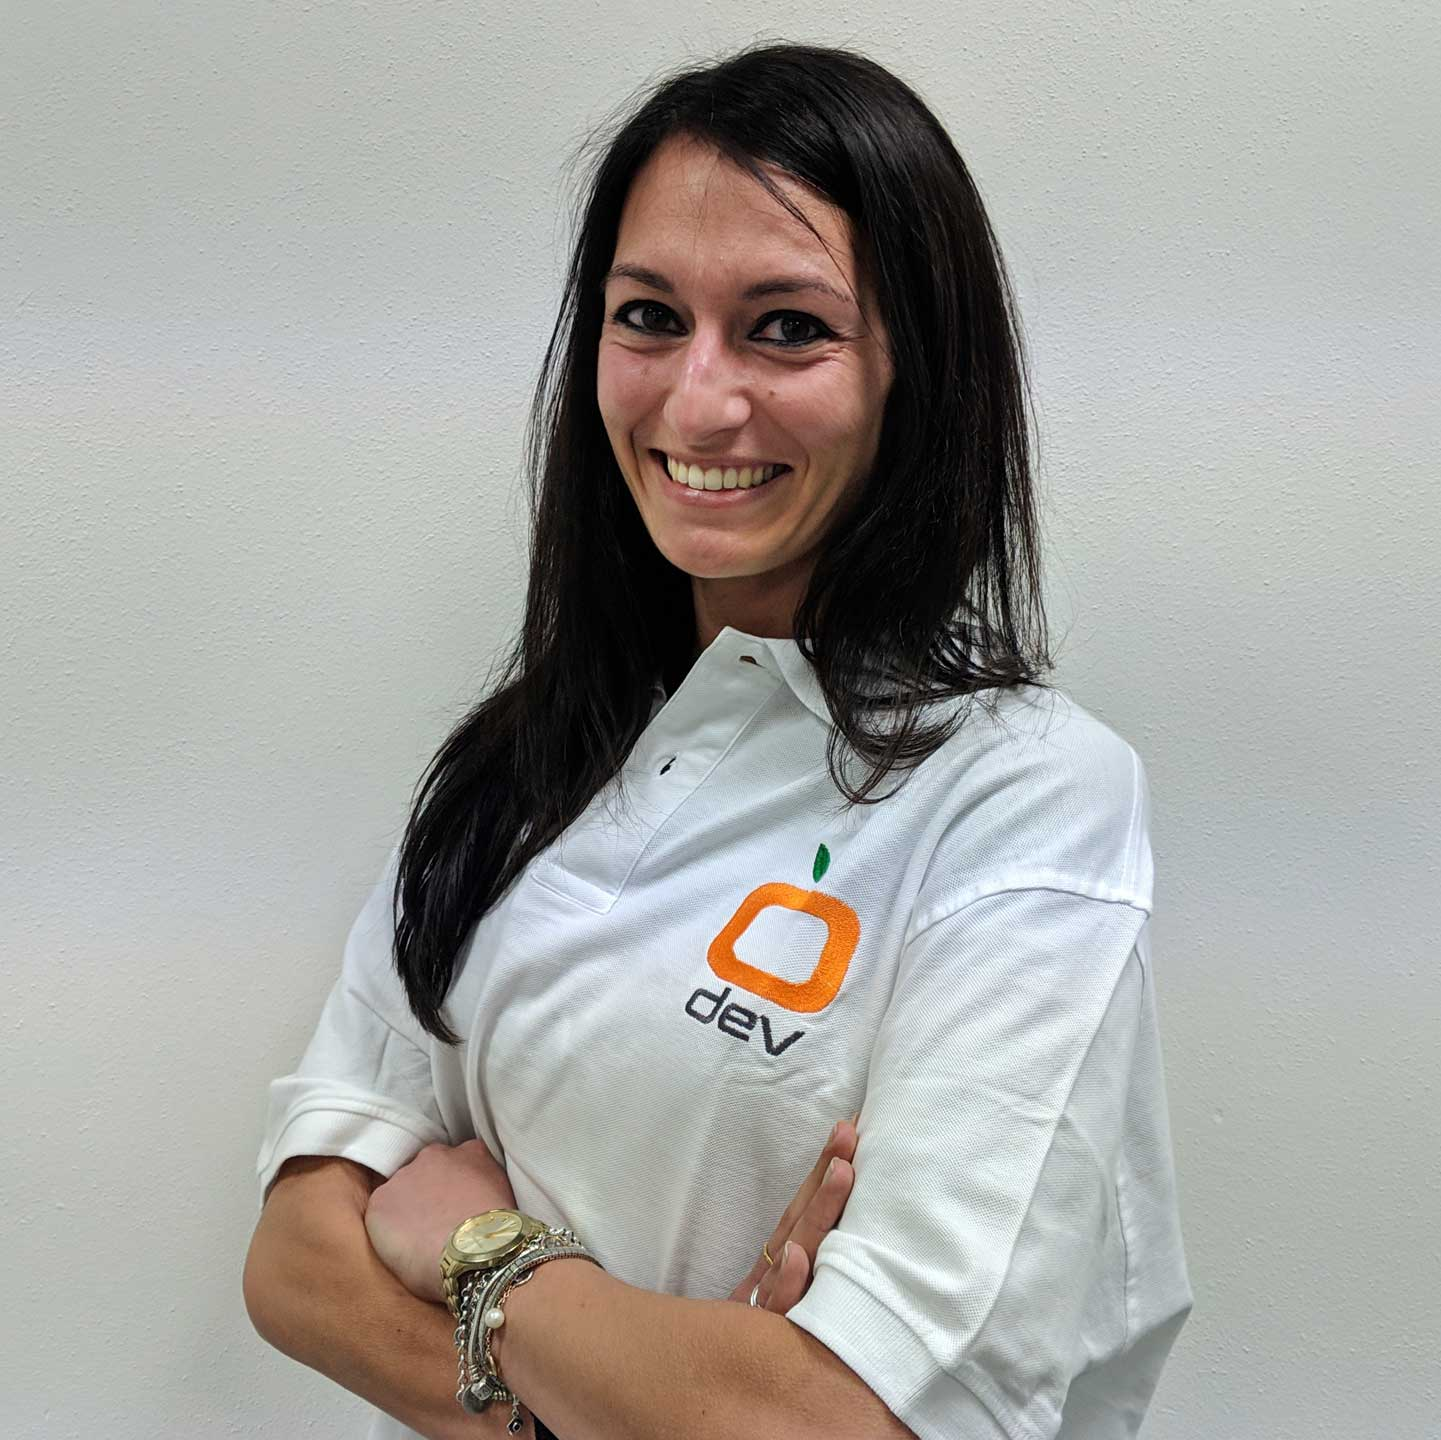 Alessandra Morelli